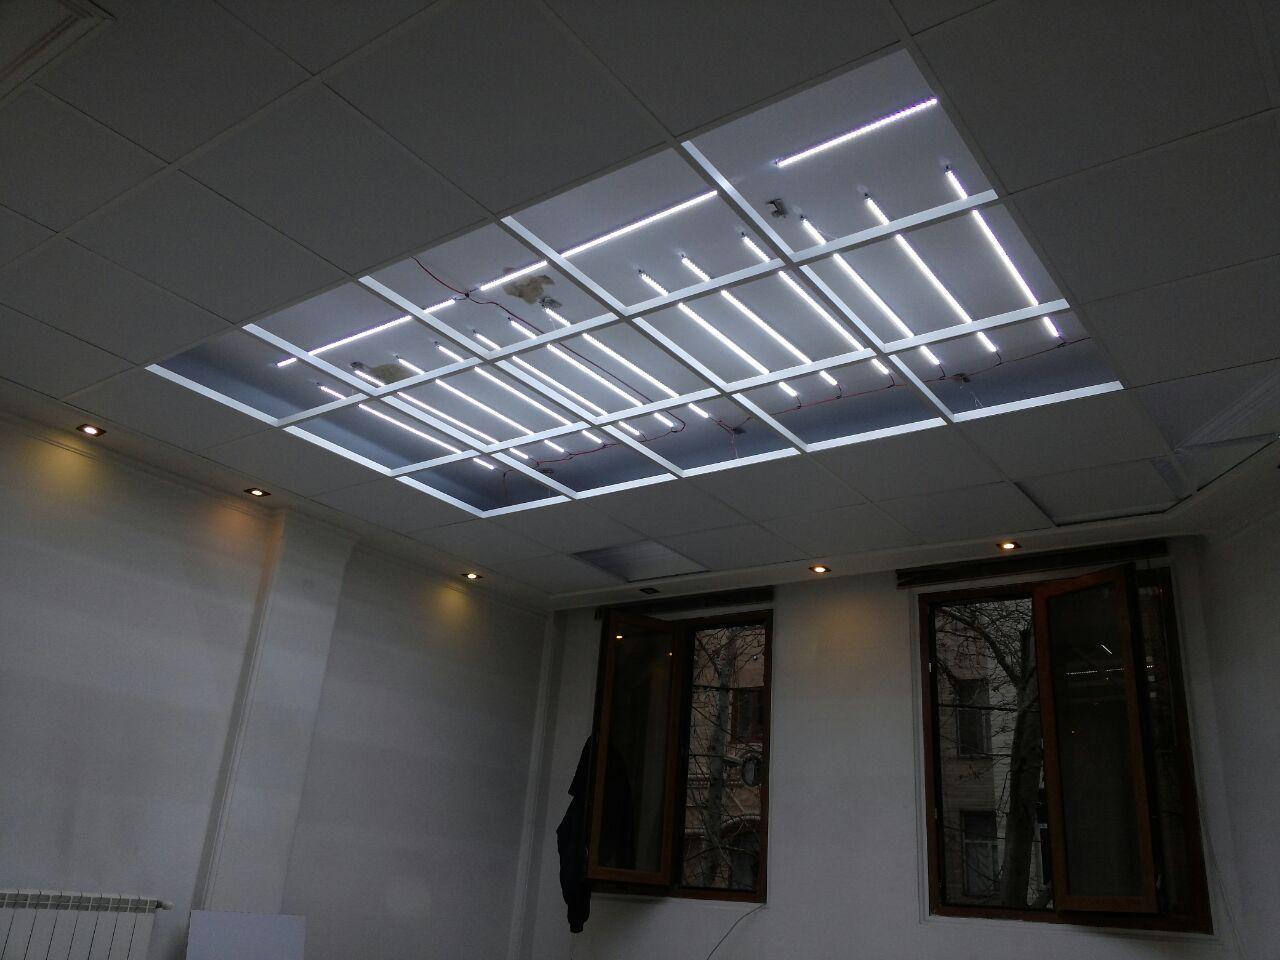 نحوه صحیح نور پردازی آسمان مجازی فروش آسمان مجازی Neon